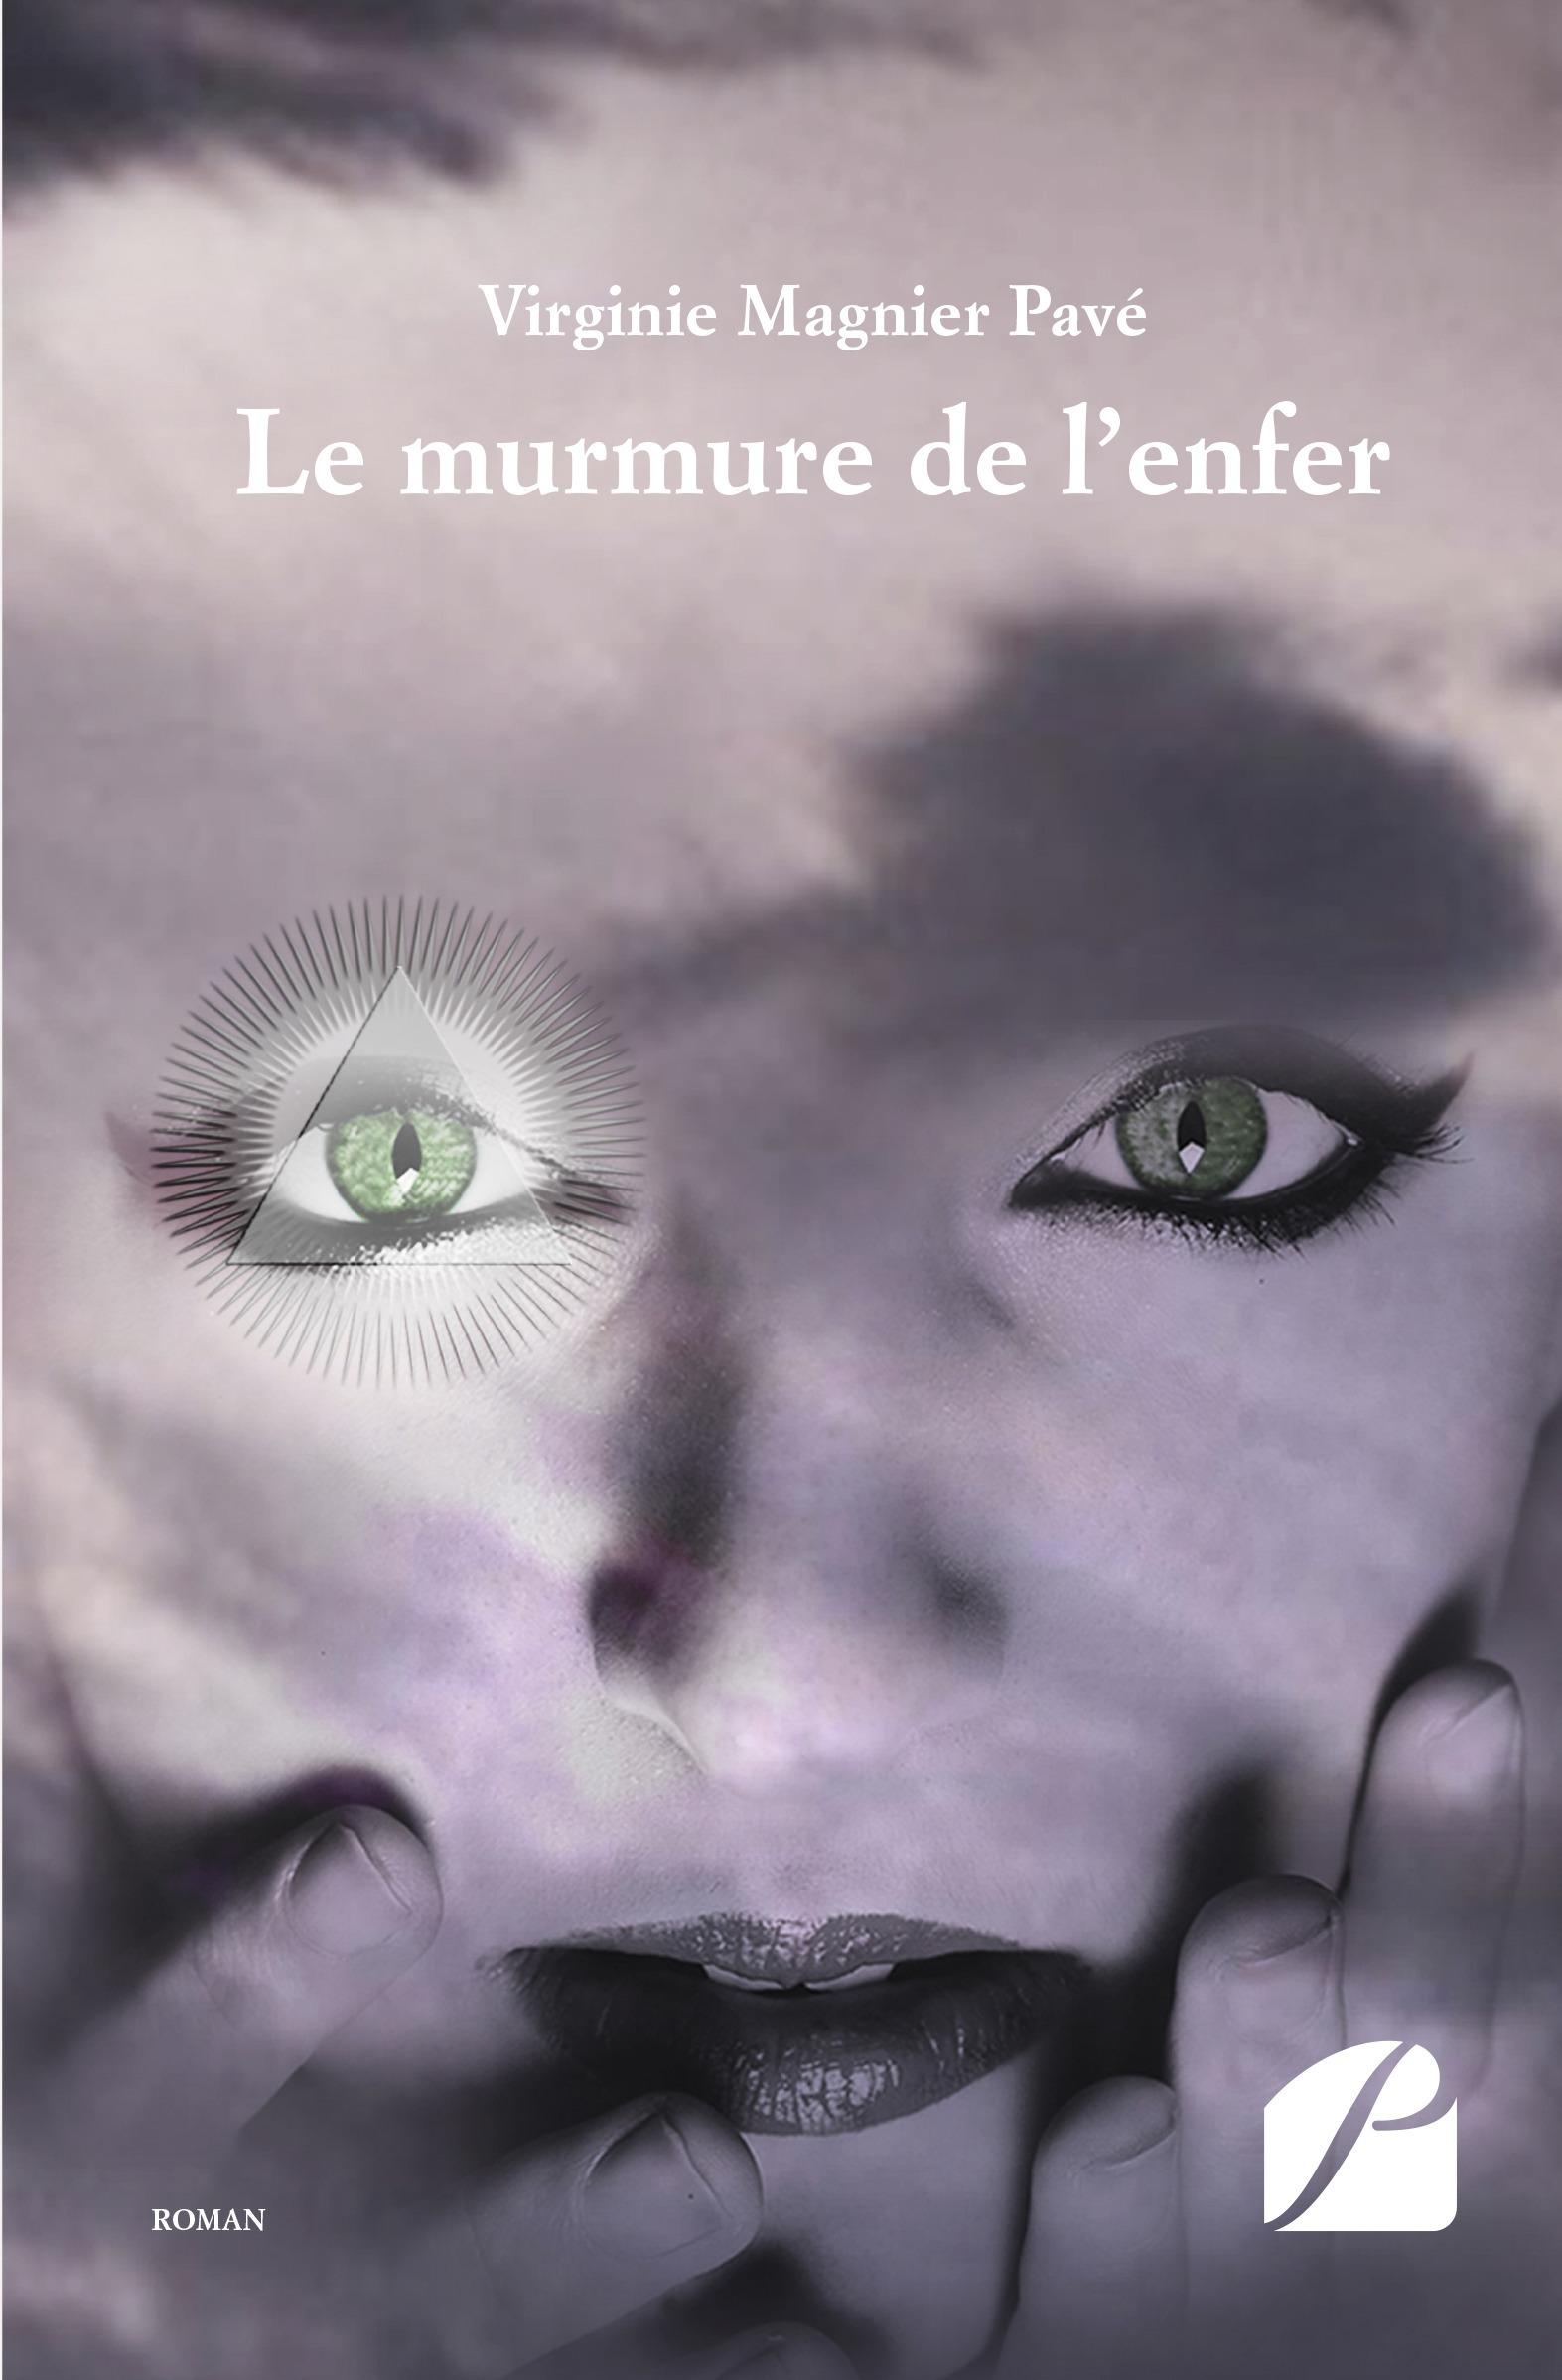 Virginie Magnier Pavé Le murmure de l'enfer